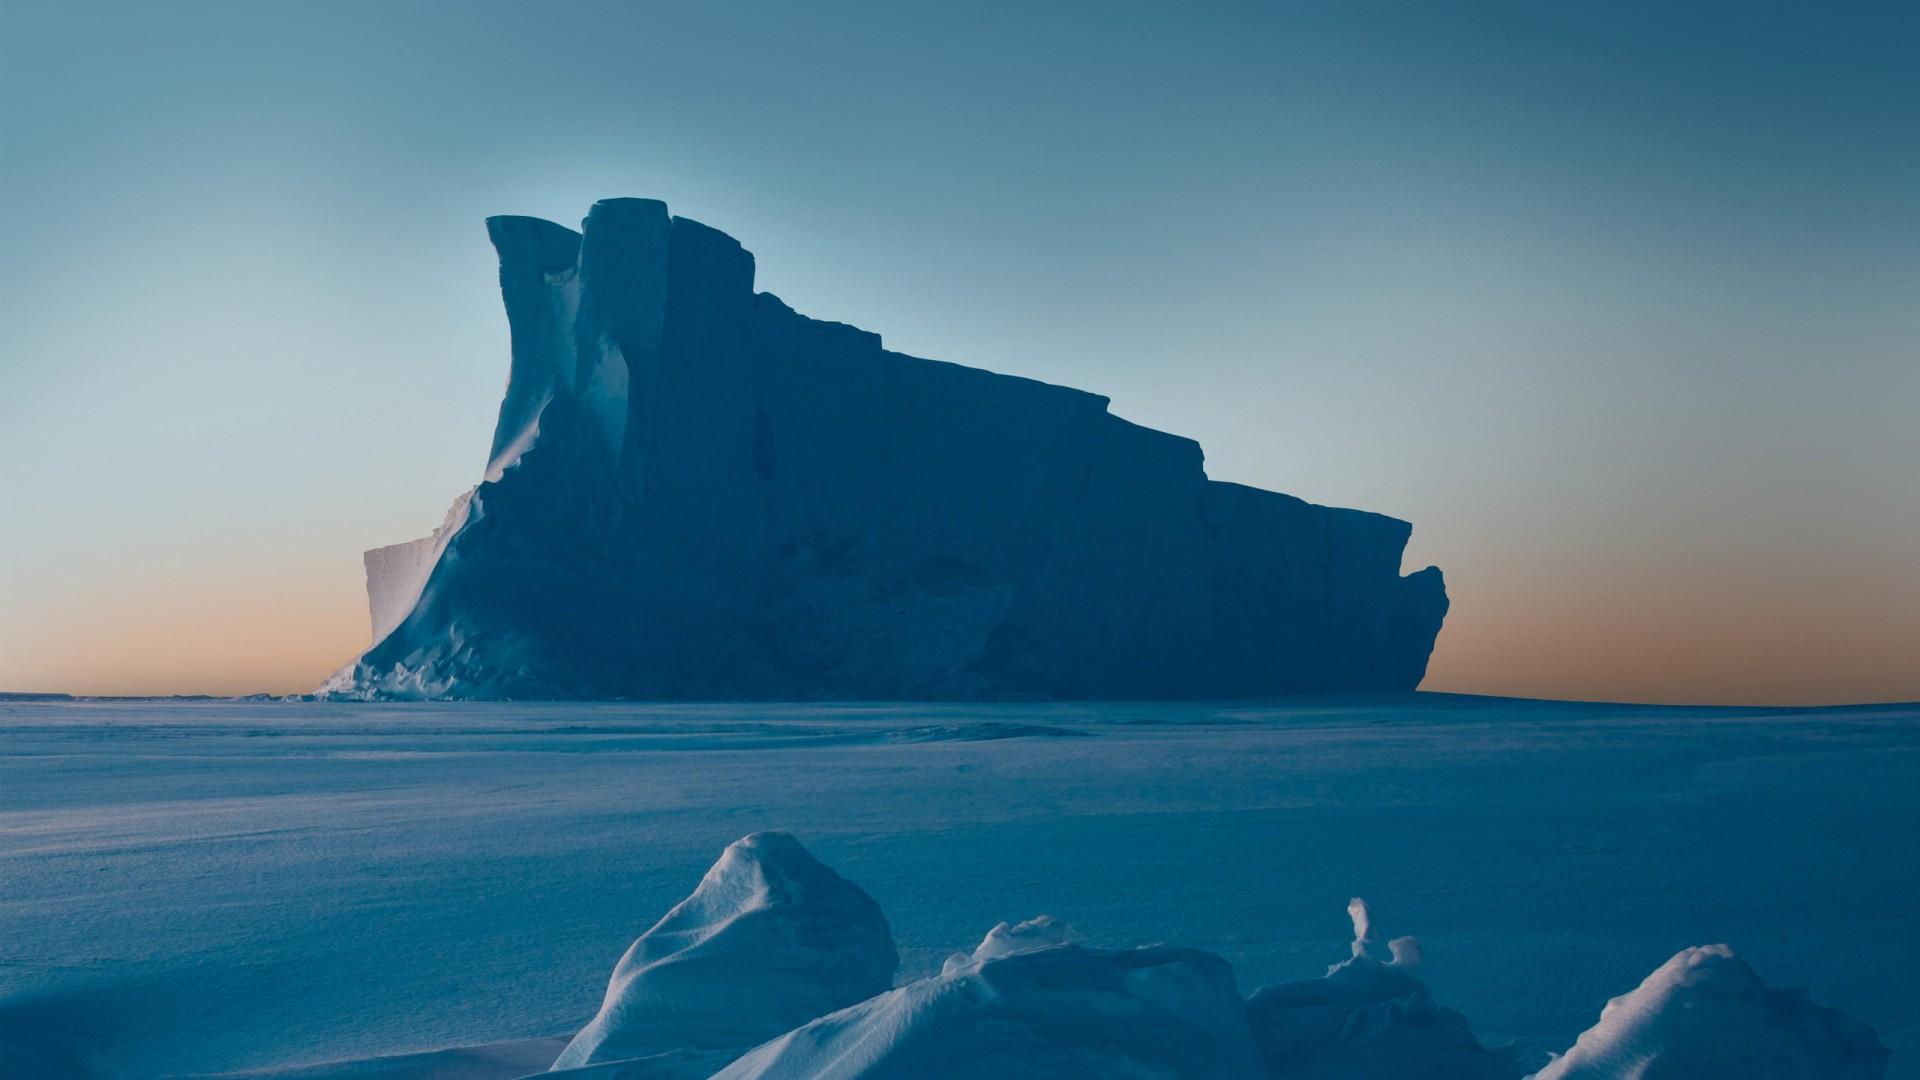 Iphone 5s Cute Wallpaper Hd Iceberg Google Pixel Stock Hd Wallpapers Hd Wallpapers